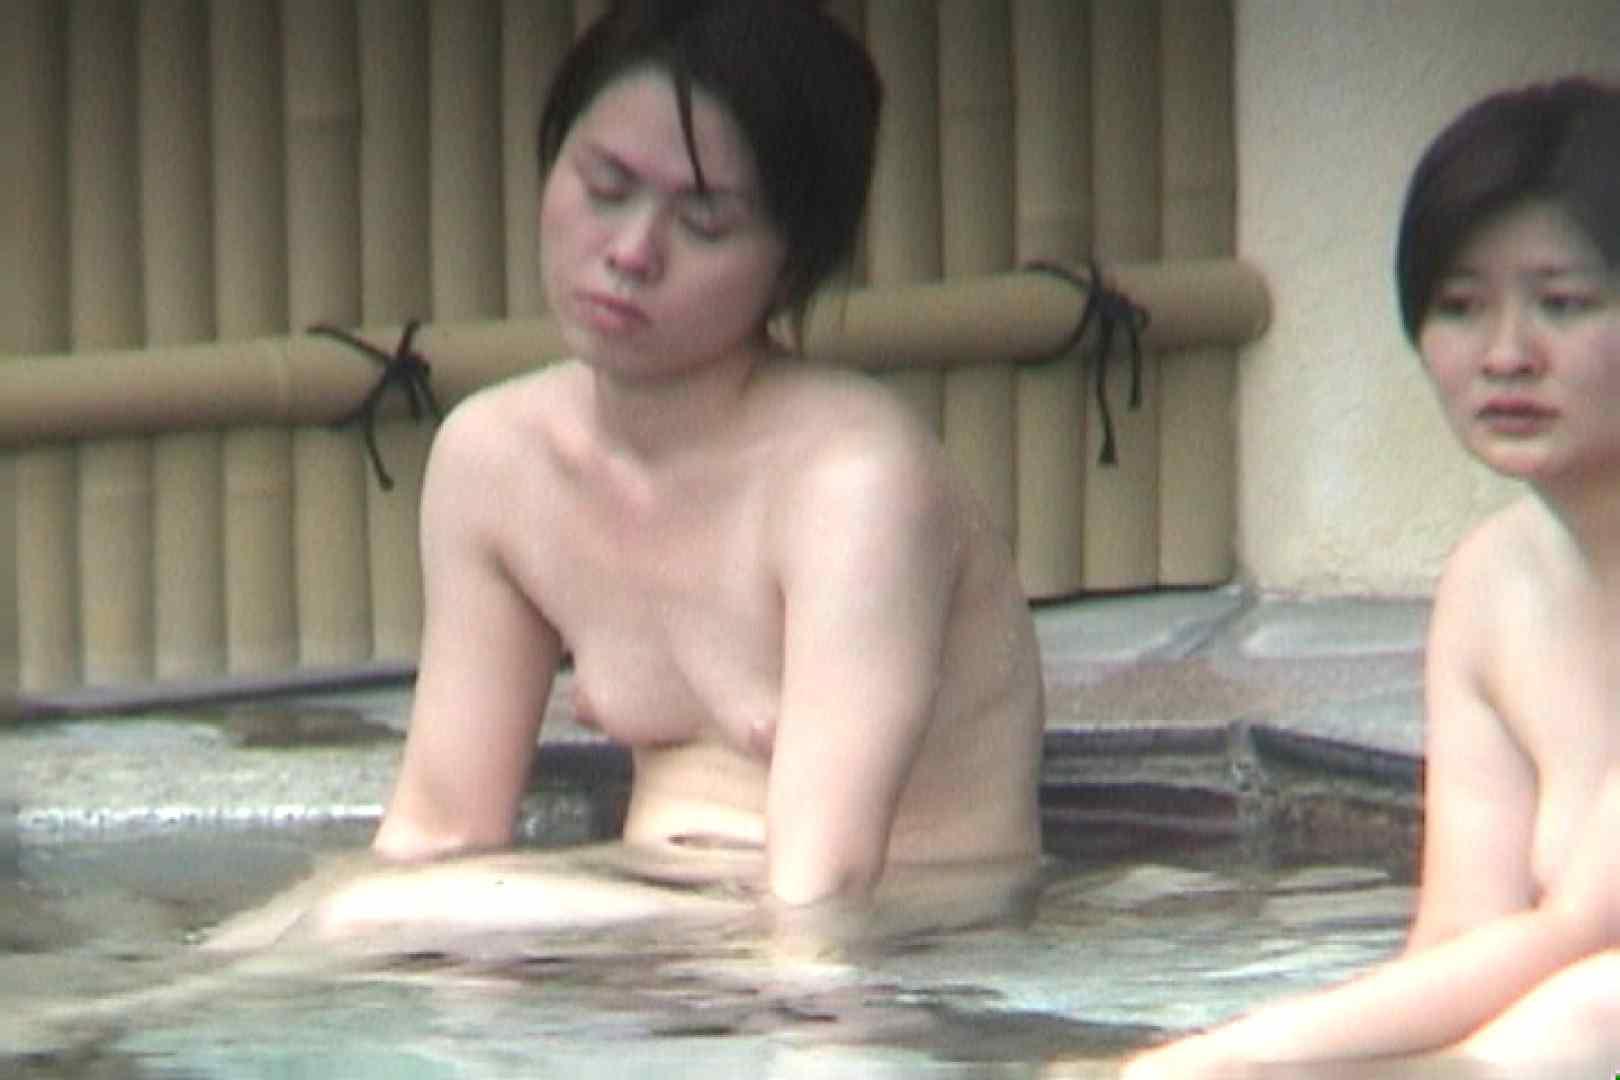 Aquaな露天風呂Vol.558 露天 AV無料動画キャプチャ 81画像 38